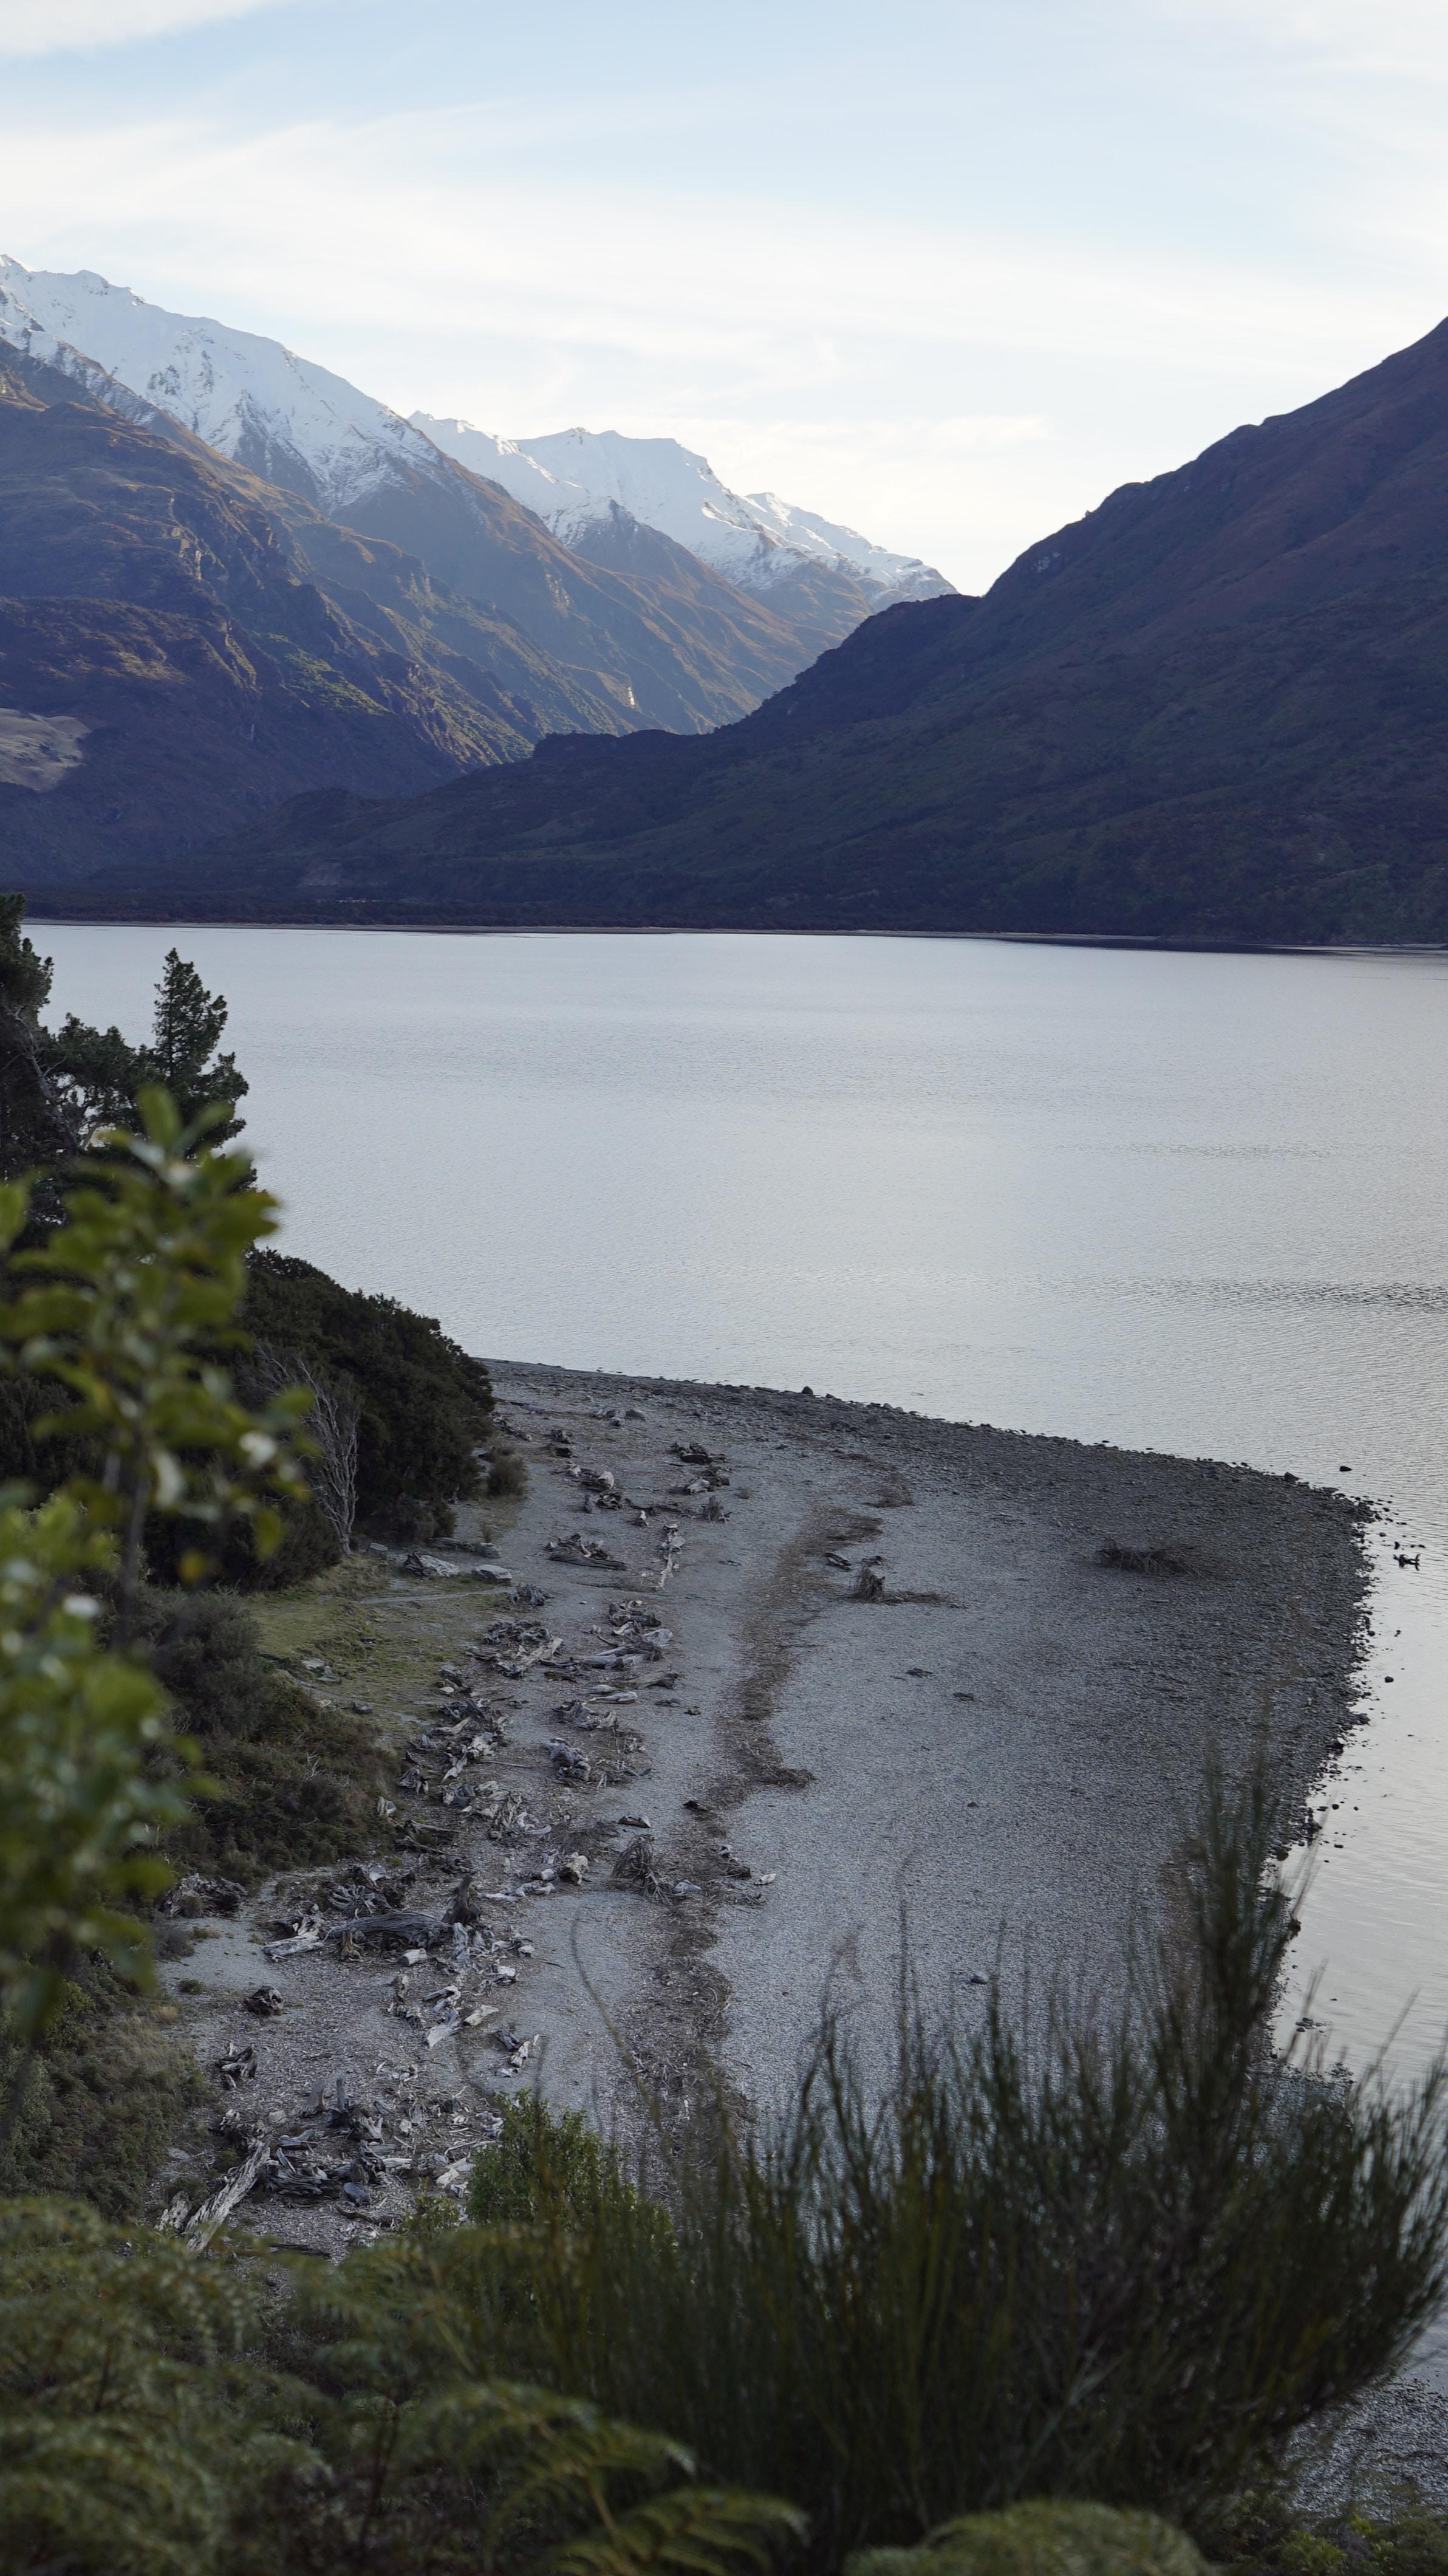 mountain range near body of water